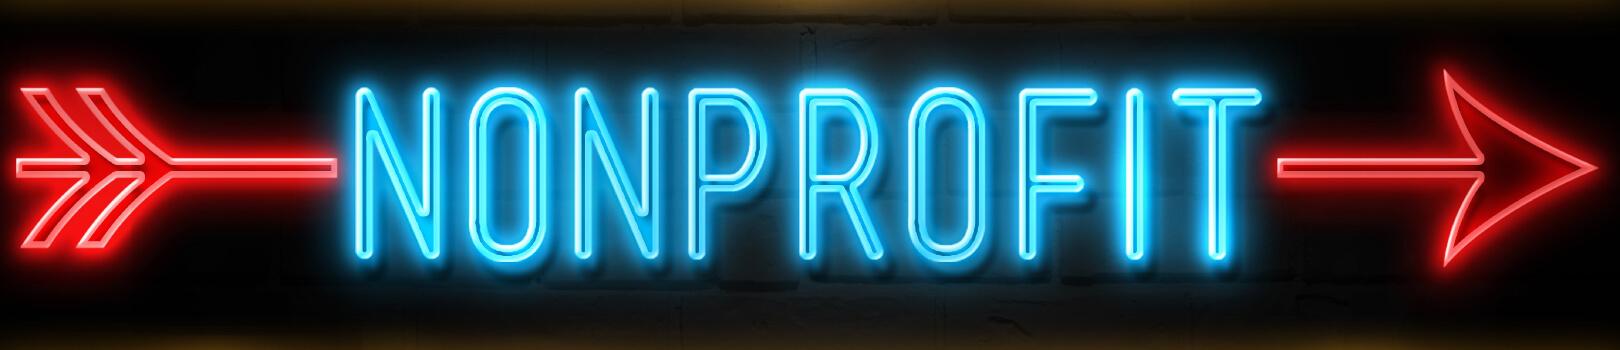 Nonprofit sign